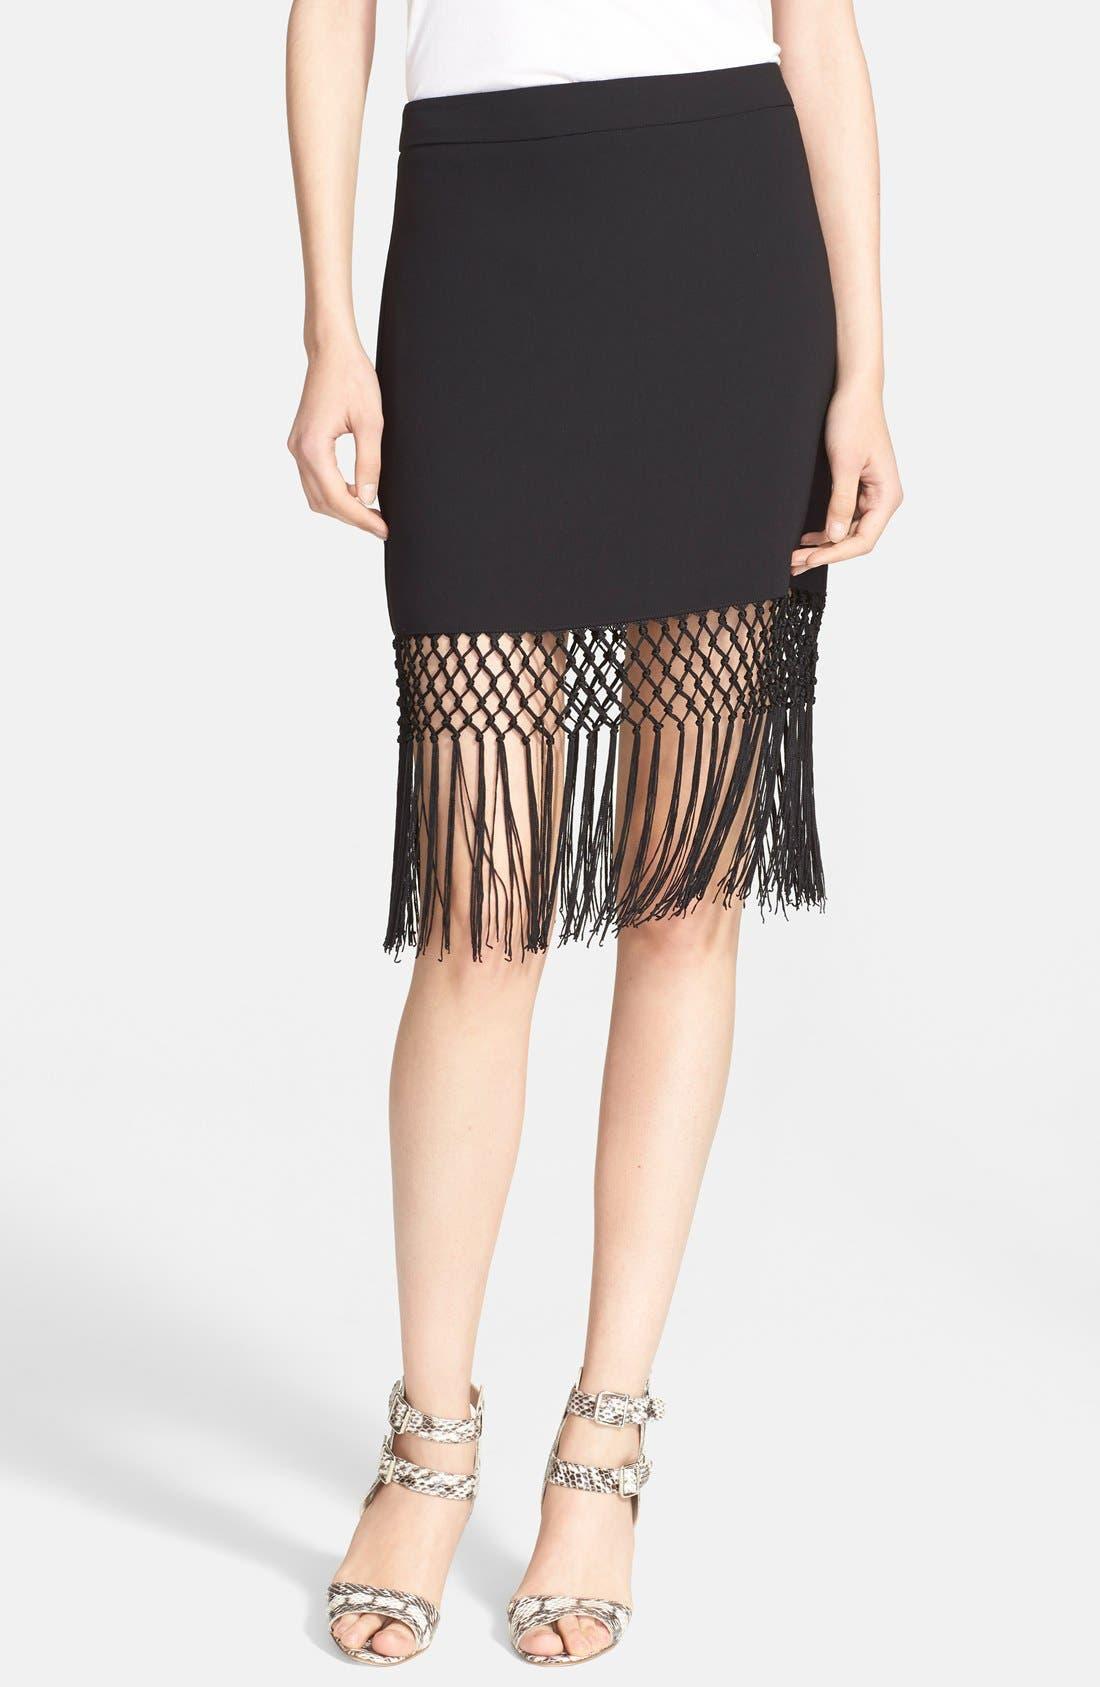 Alternate Image 1 Selected - Trina Turk 'Luciana' Crochet Fringe Pencil Skirt